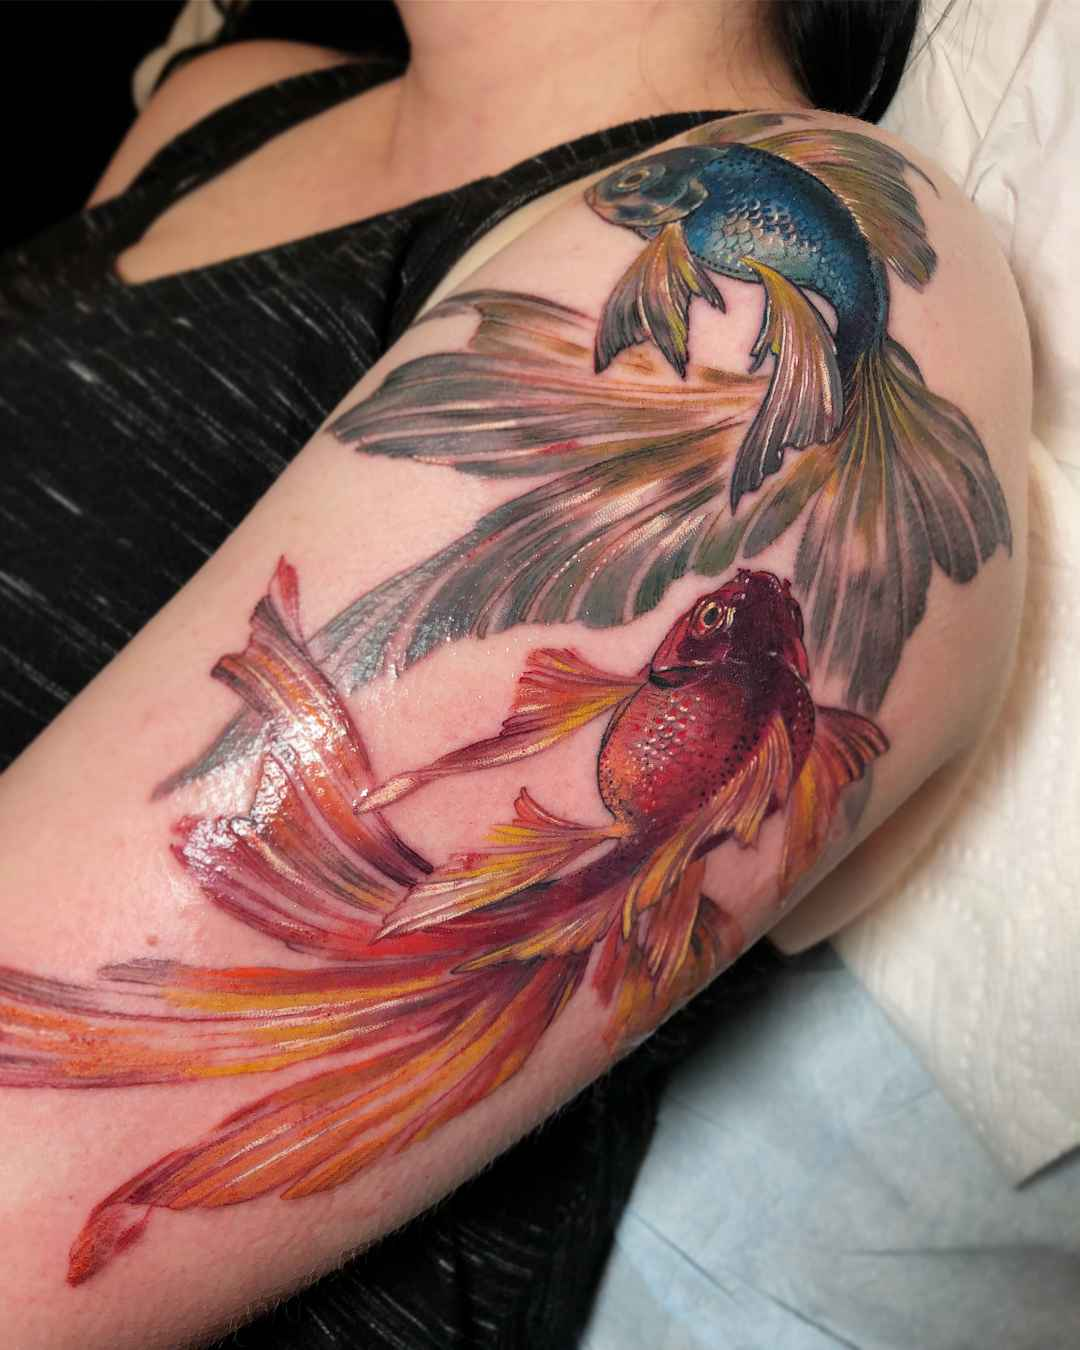 Tattoo artist Stephanie Brown